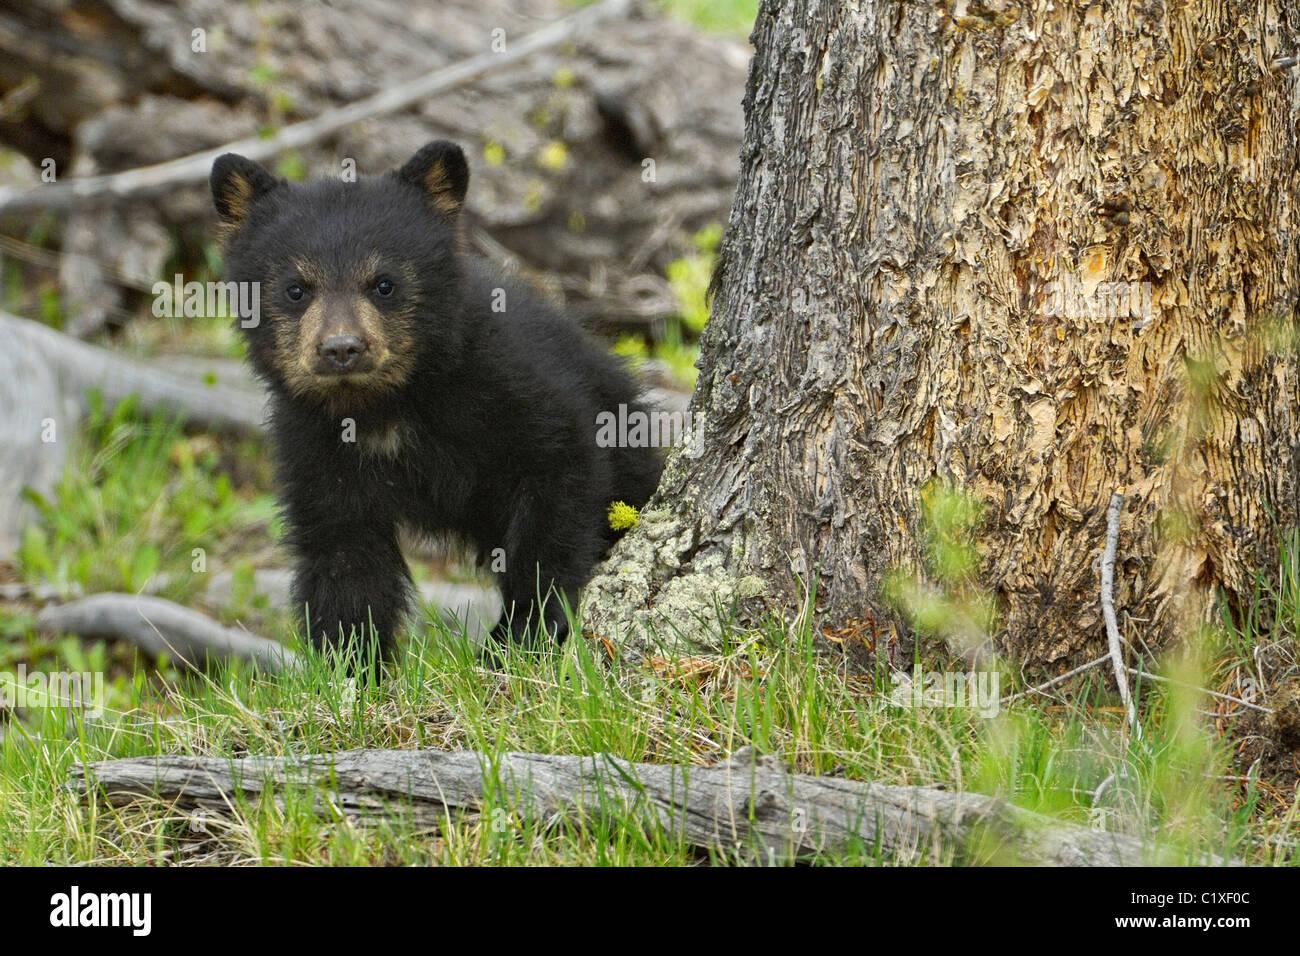 Baby black bear - Stock Image